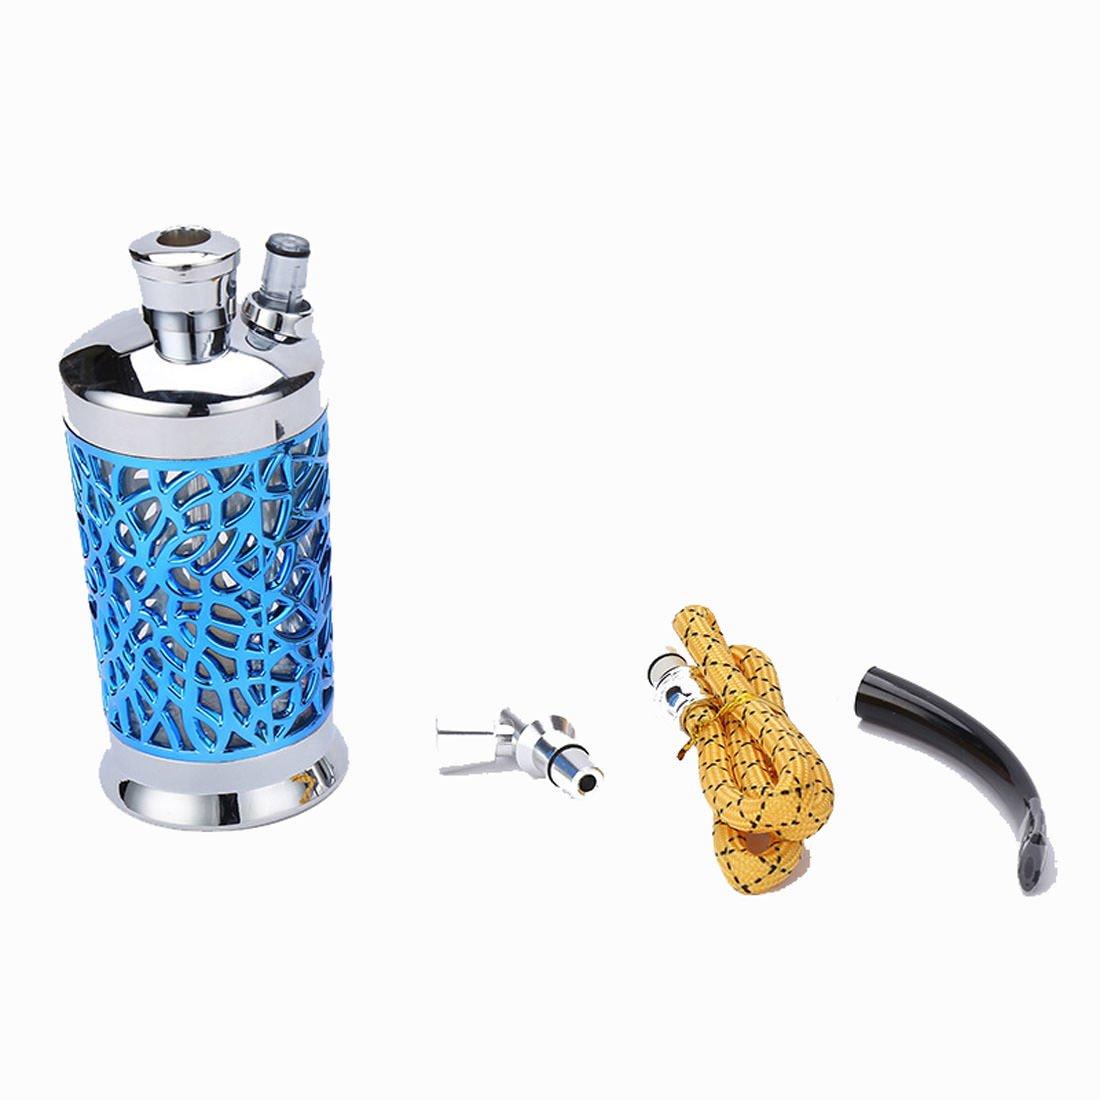 Mini Size Blue 1 Hose Hookah with Accessories Set Shisha Metal Material